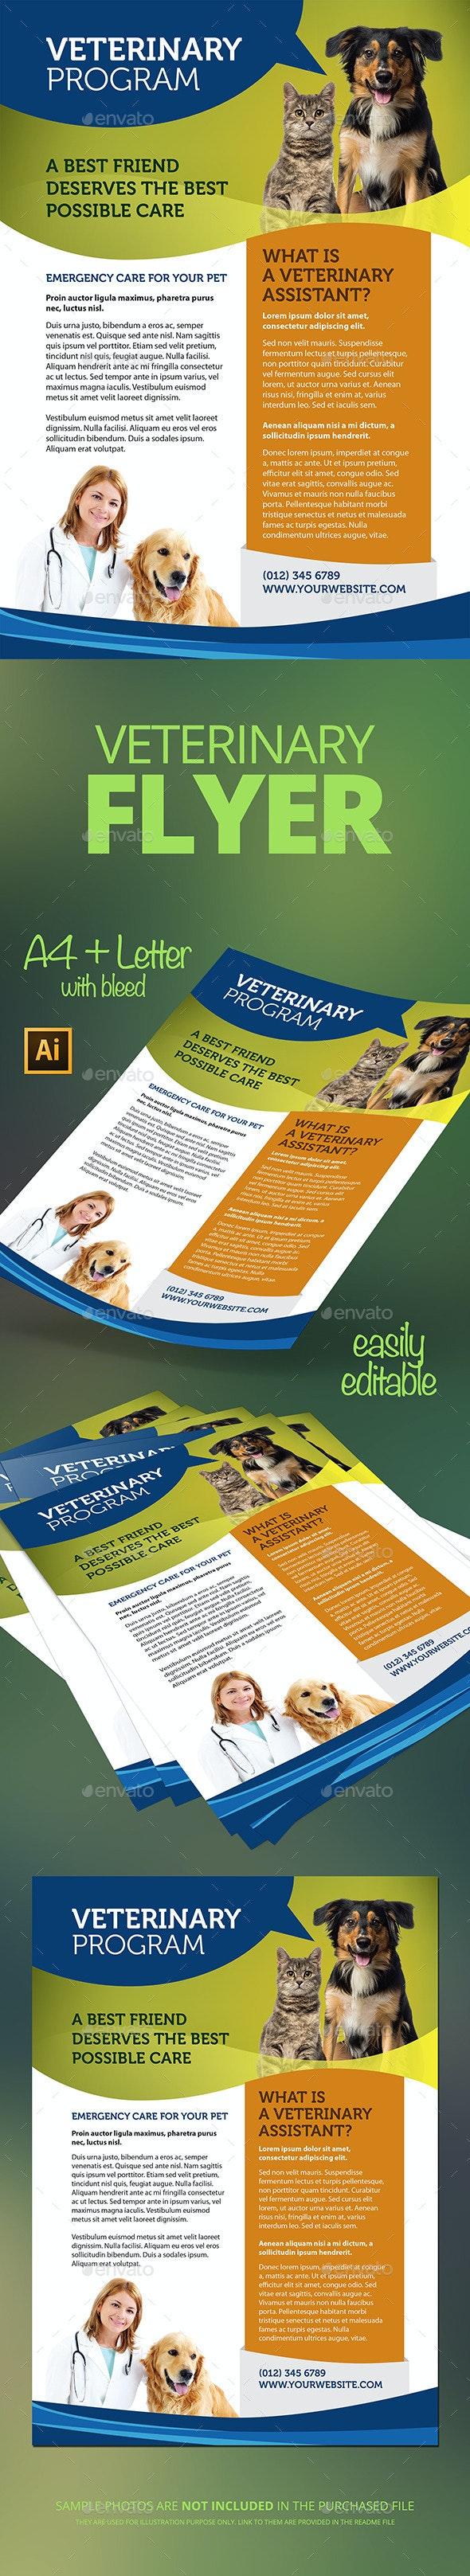 Veterinary Flyer - Flyers Print Templates